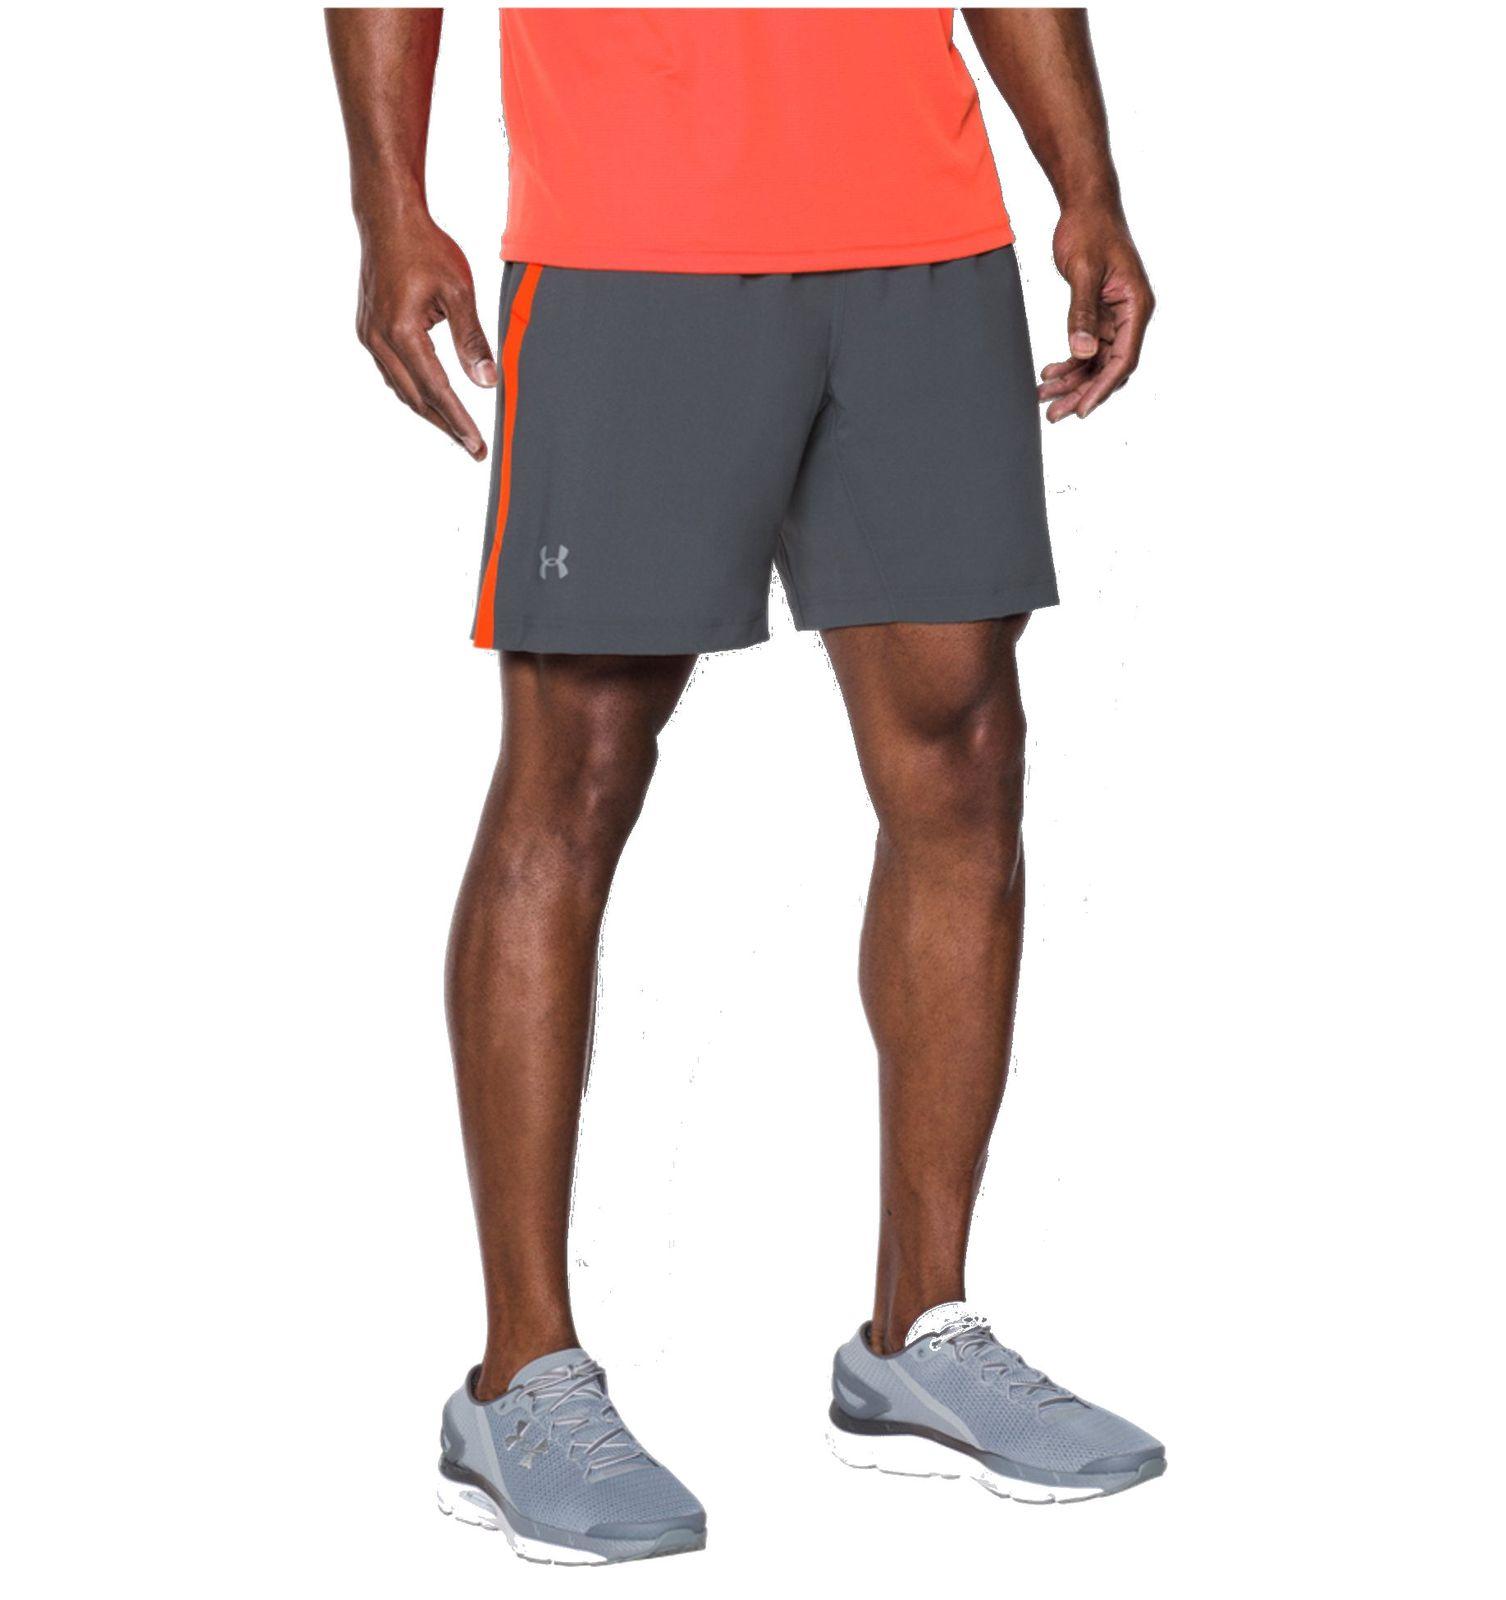 under armour herren sport fitness short 2 in 1 shorts ua launch grau rot ebay. Black Bedroom Furniture Sets. Home Design Ideas